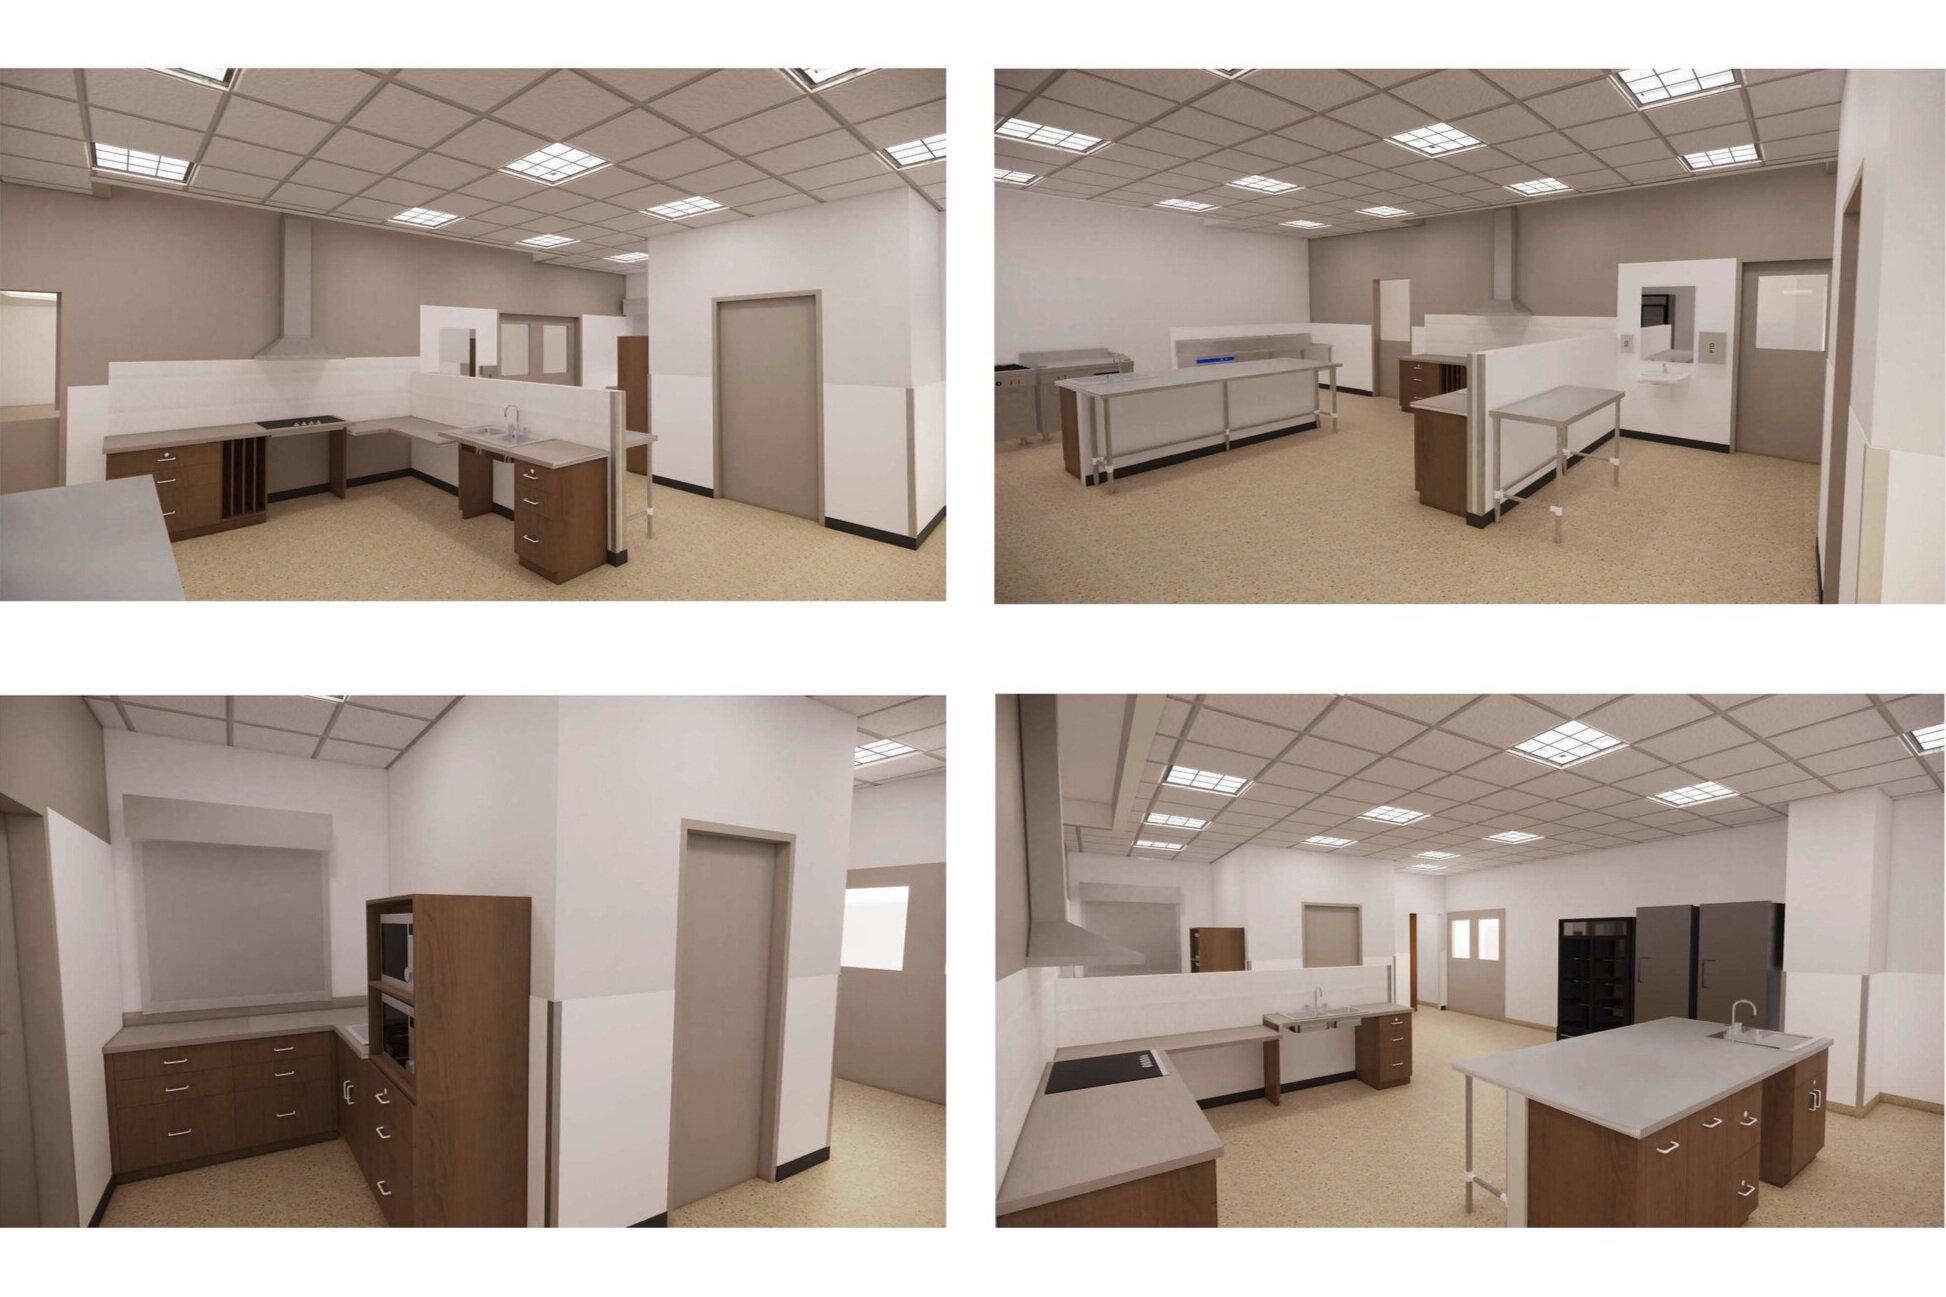 Final Kitchen 3D Design Rendering